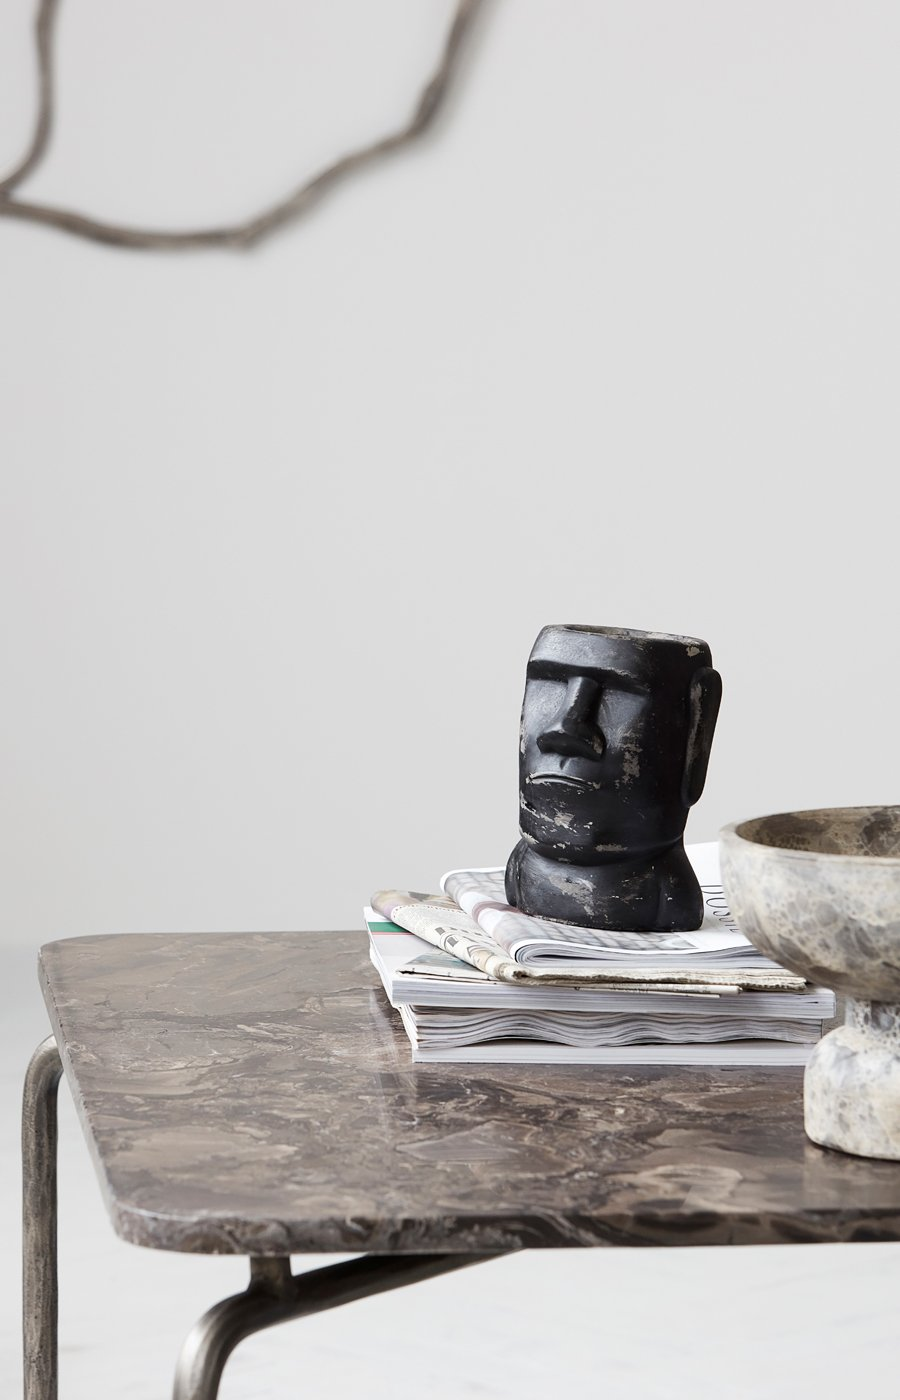 Deko-Objekte & Figuren, Bild 1